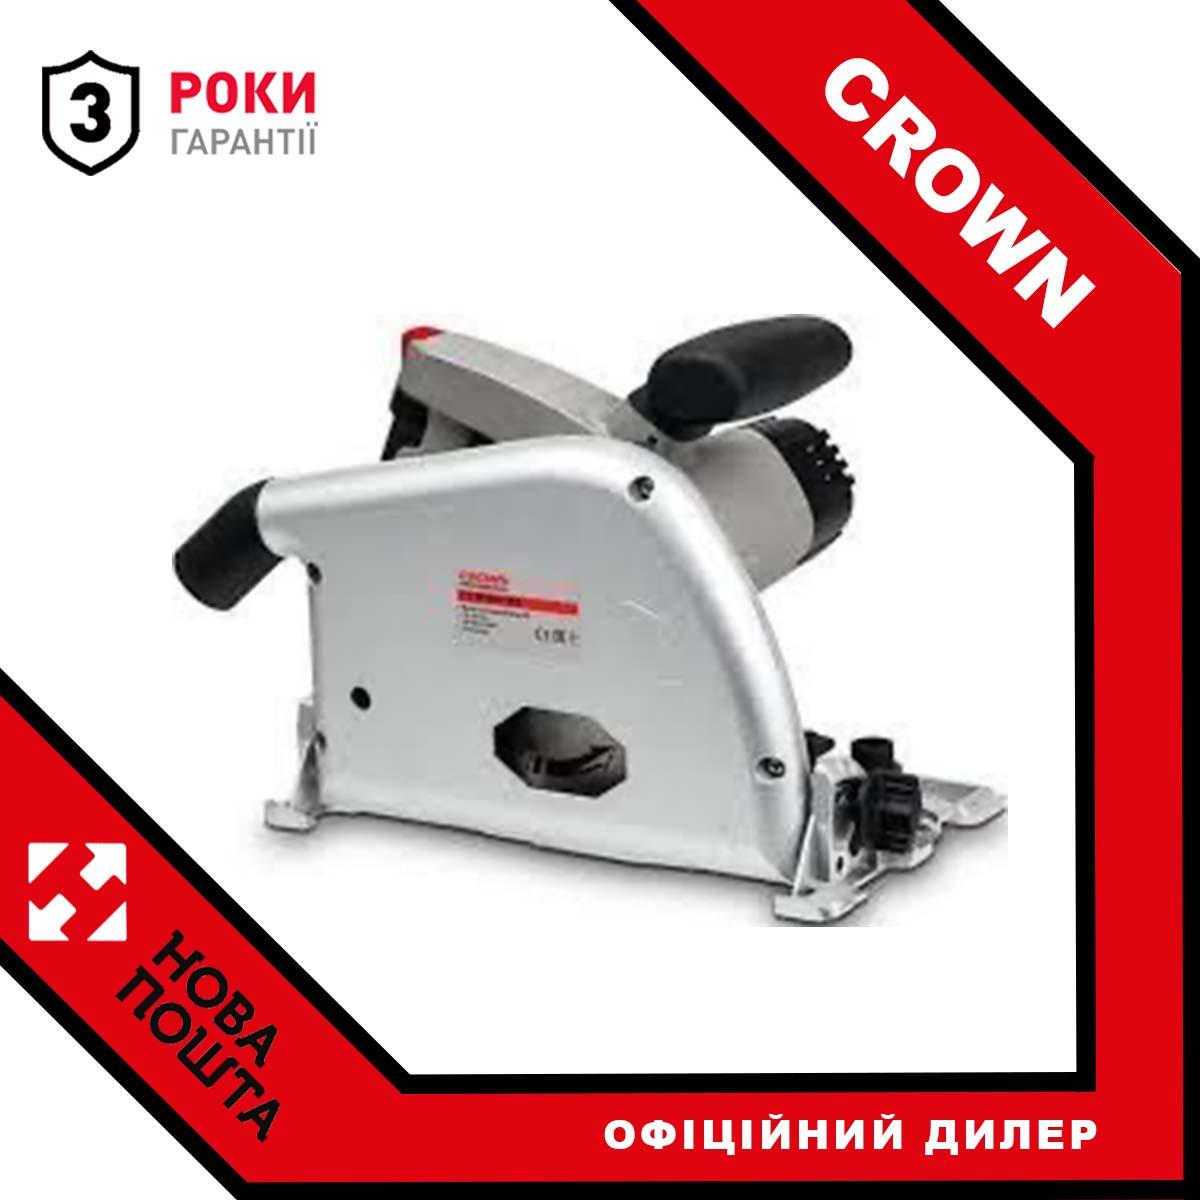 Погружная дисковая пила Crown CT15134-165